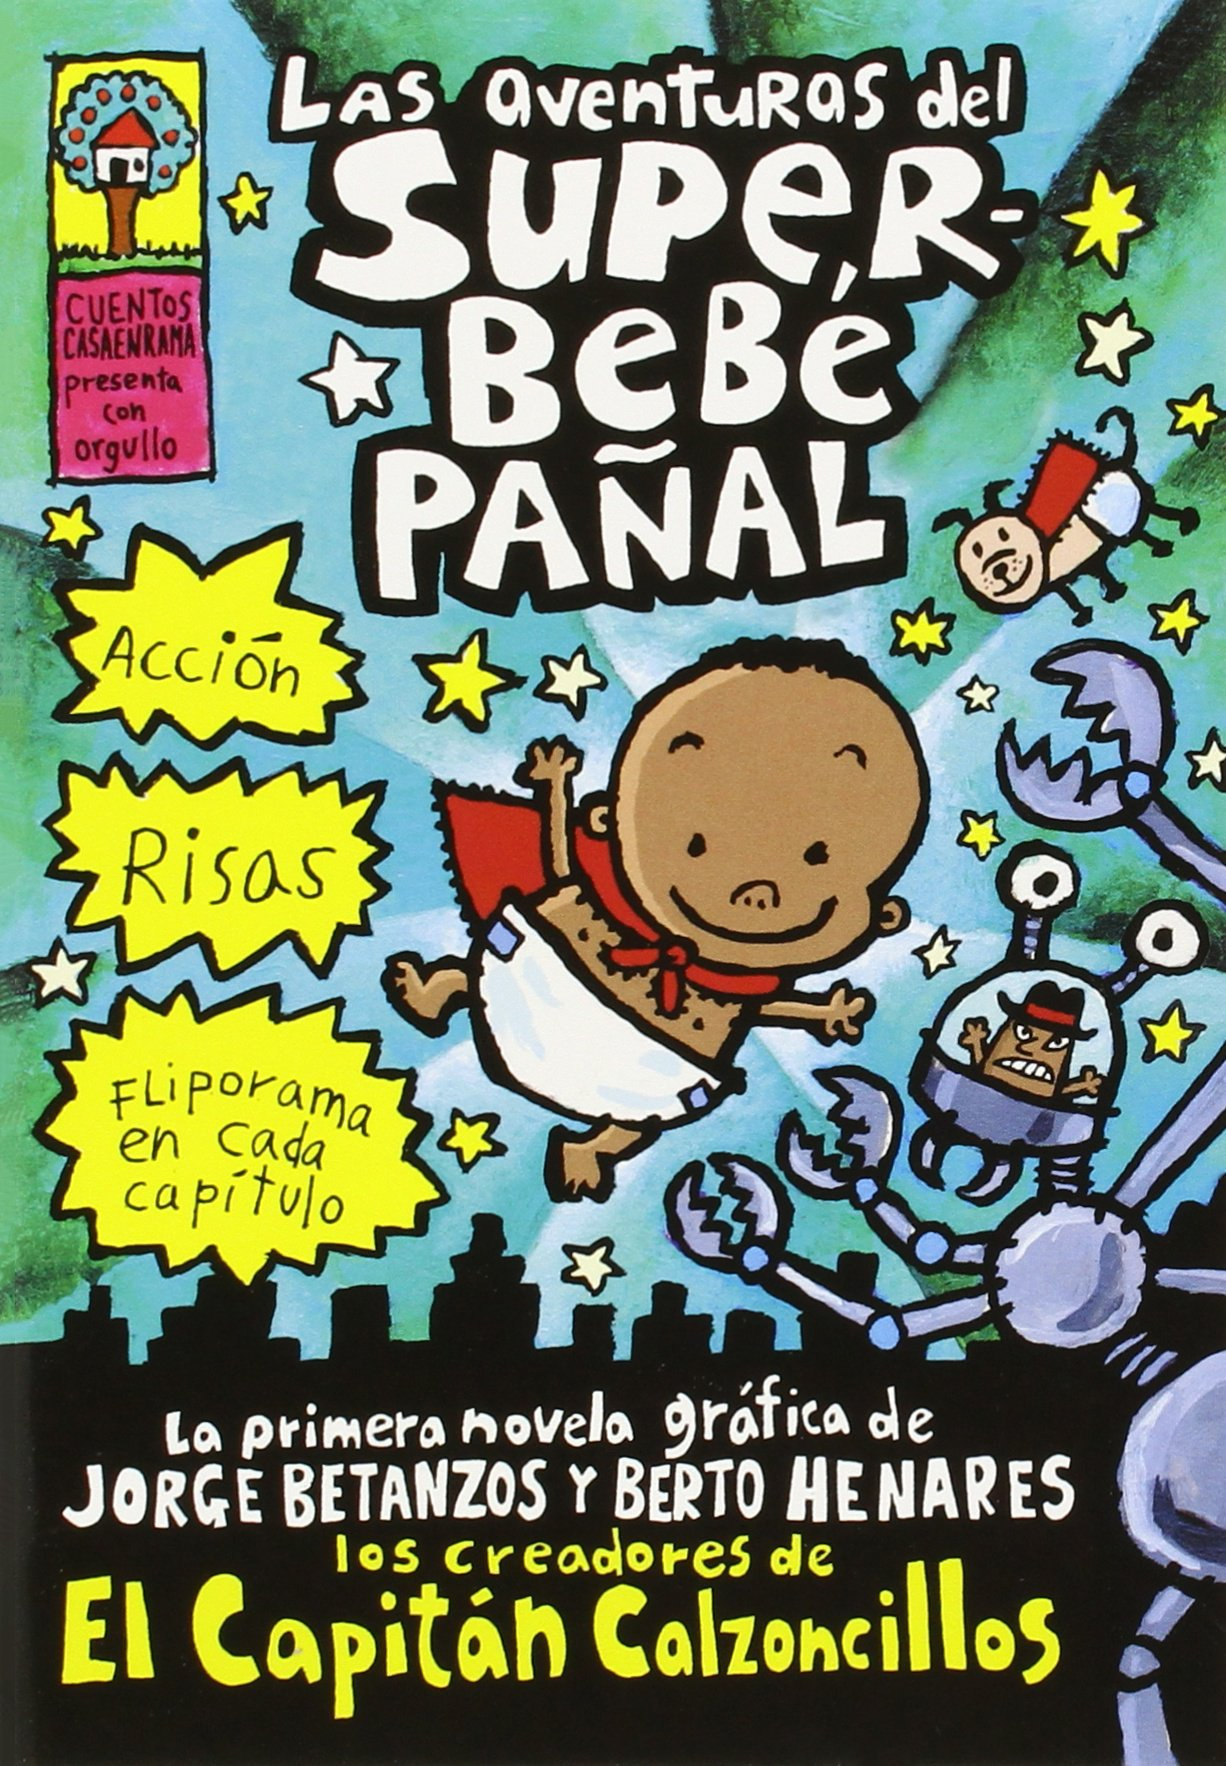 Las Aventuras de Superbebé Pañal the Adventures of Super Diaper Baby : spanish Language Edition of the Adventures of Super Diaper Baby El Superbebe Panal ...